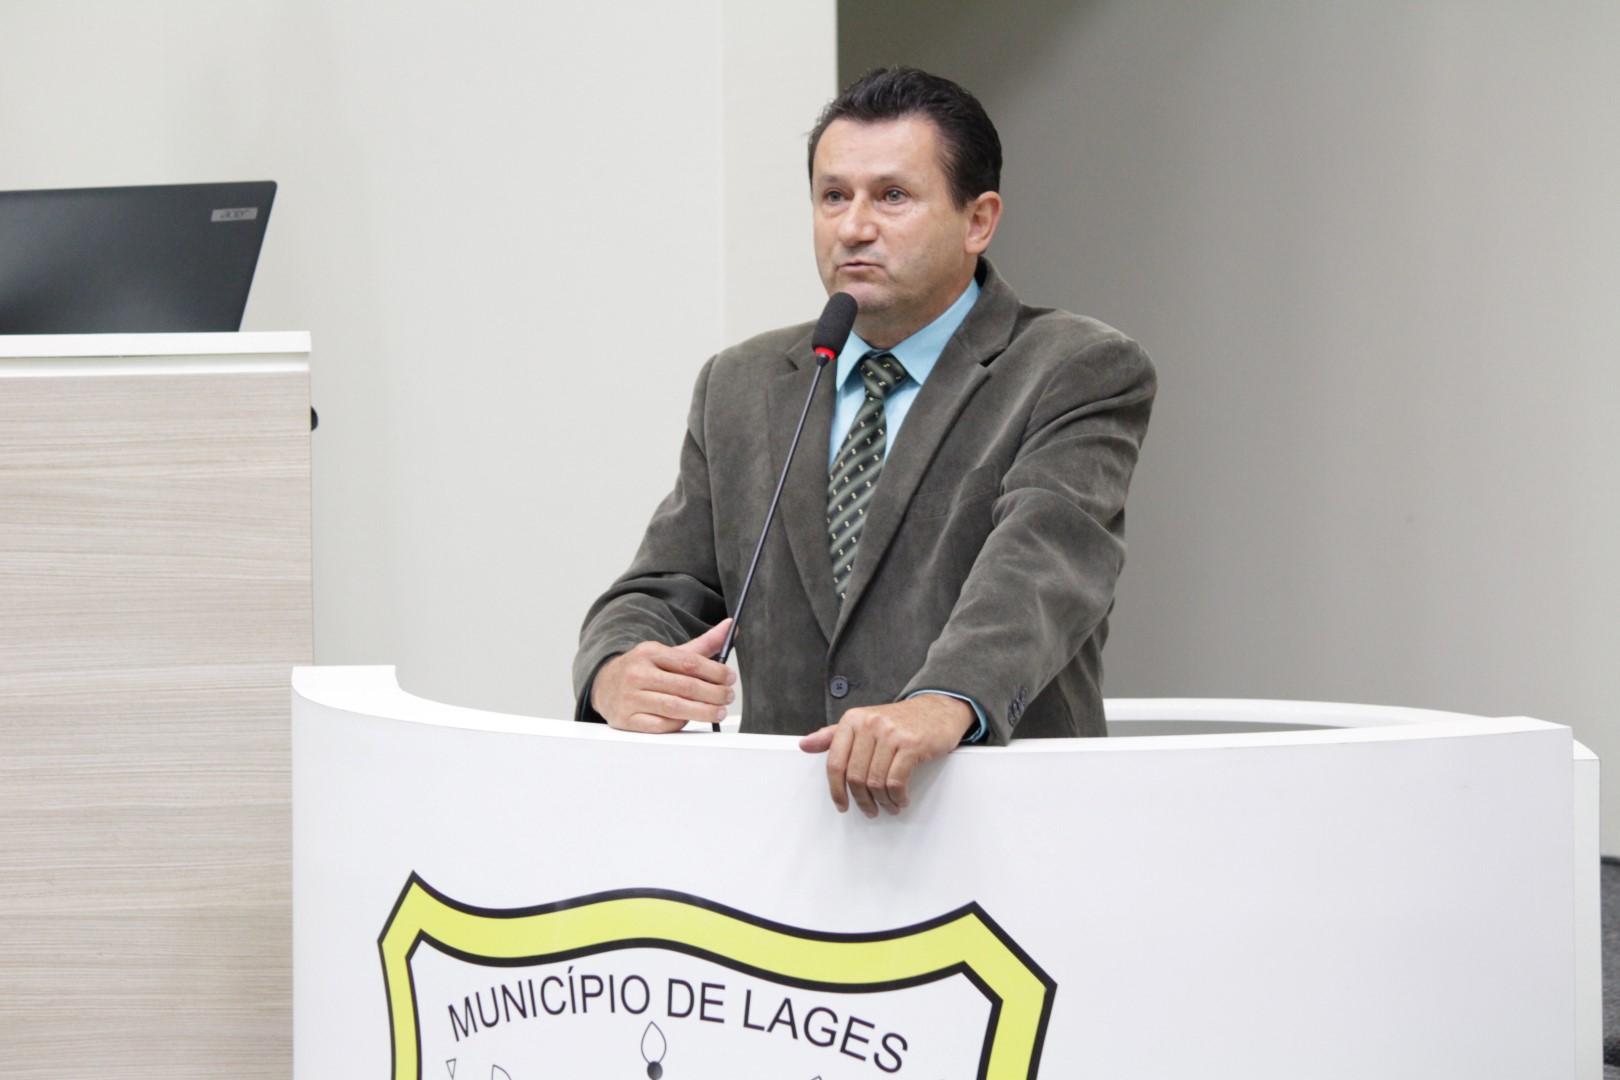 DAVID MORO